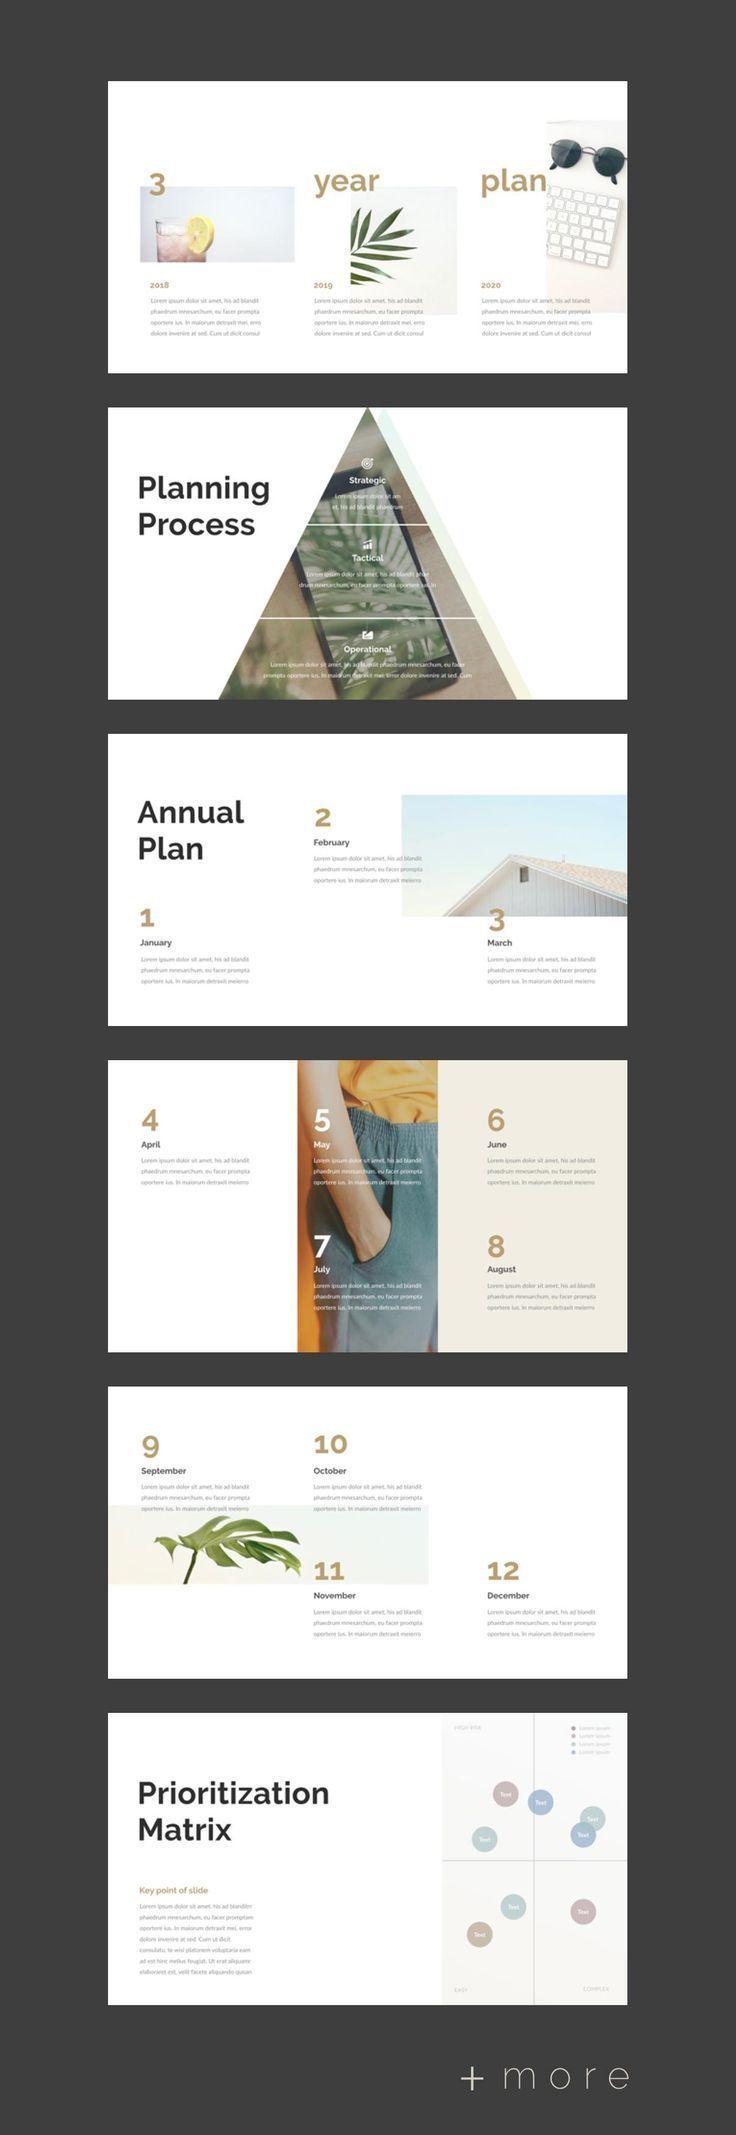 Planner powerpoint template apresentao e composio toneelgroepblik Choice Image